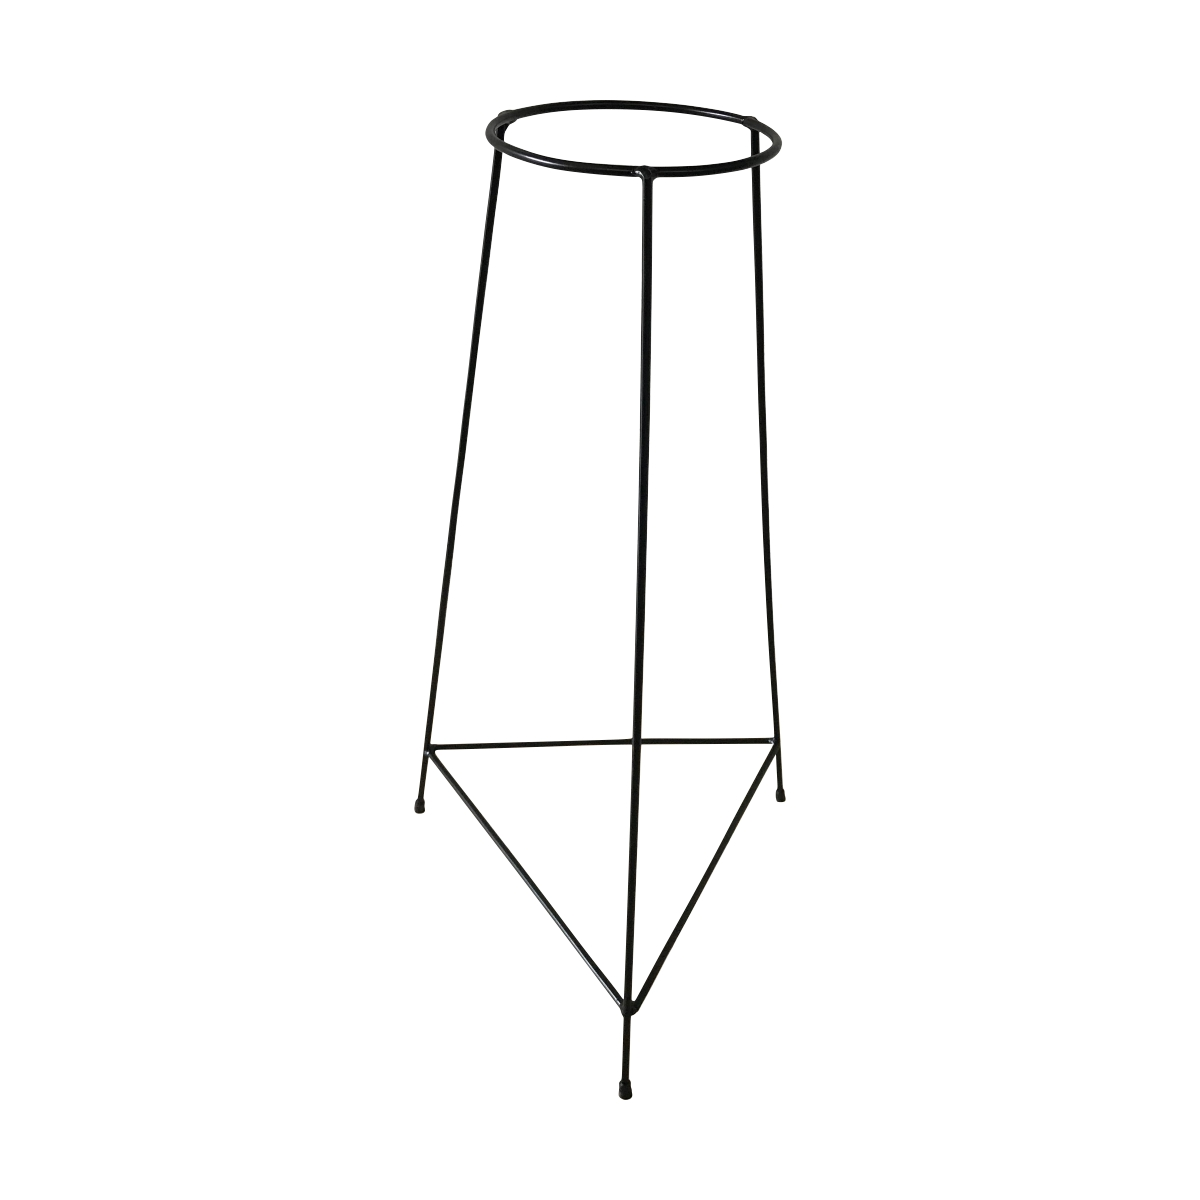 Kit 3 Suportes Tripé Triangular Preto para Vaso Autoirigável Grande N04 Raiz